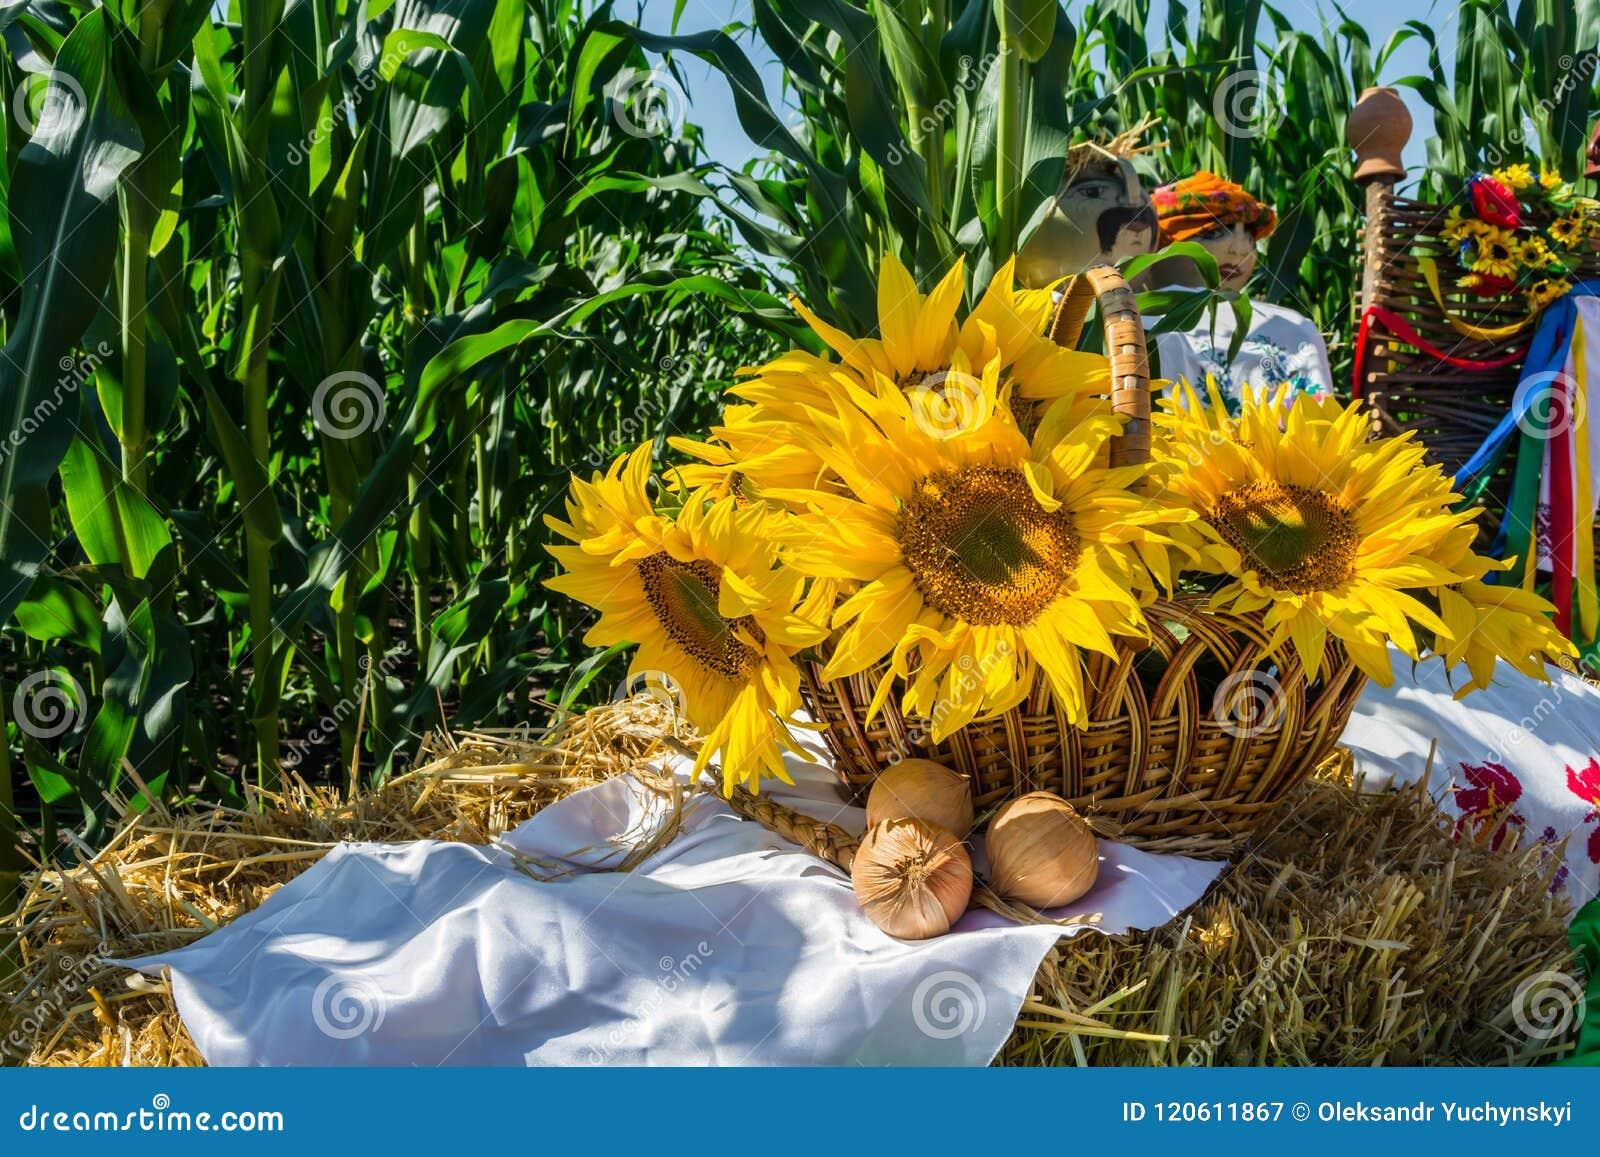 Blommor av en solros i en korg, på en sugrörbal, mot en bakgrund av ett fält av havre